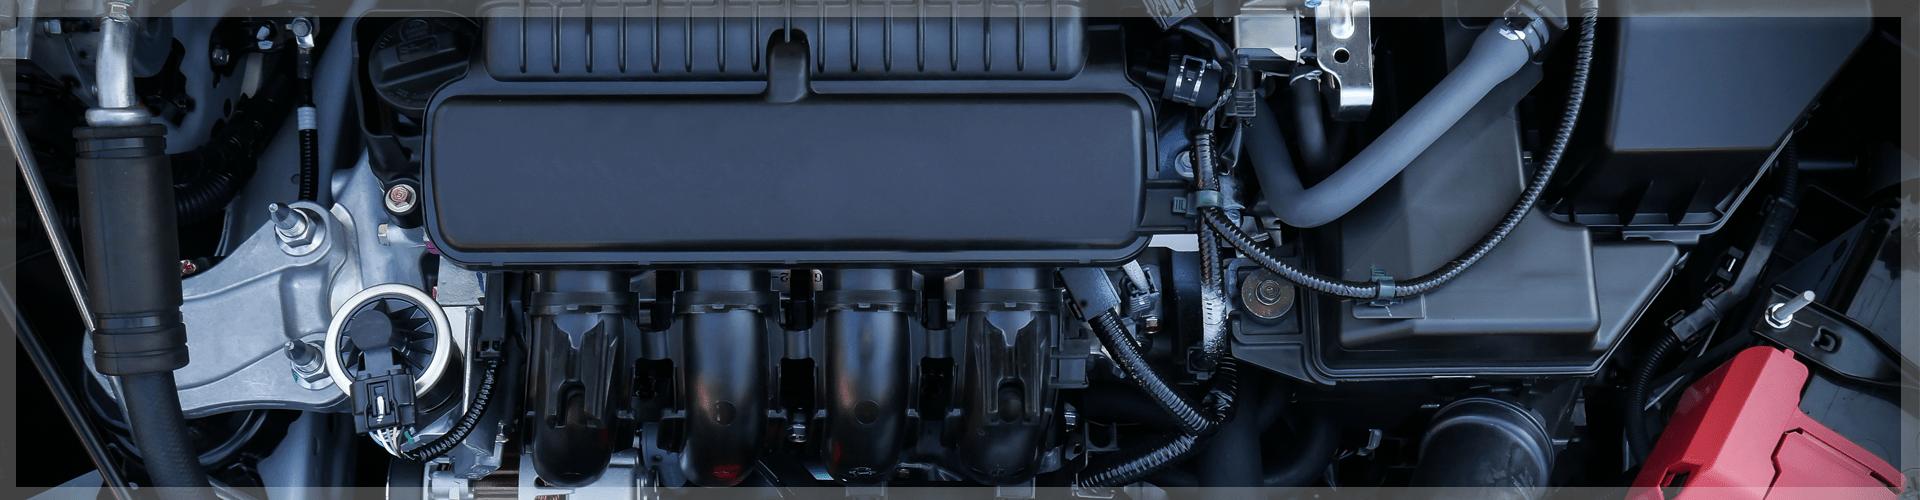 Engine repair header